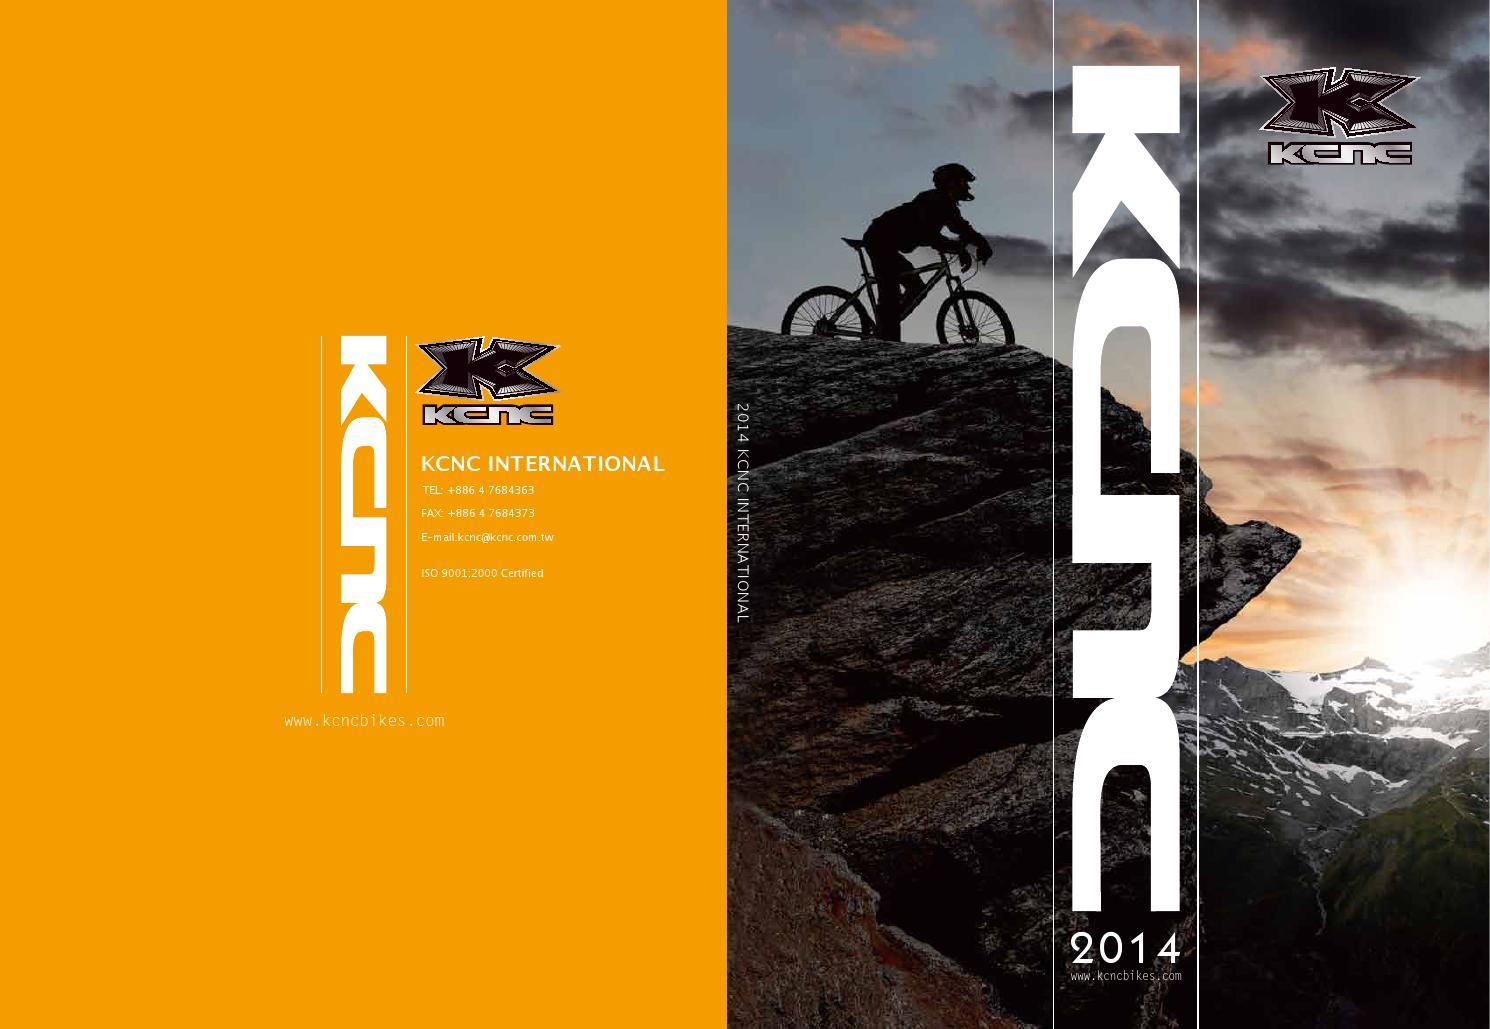 Gold KCNC Mountain MTB Bike Adjustable 18 ~ 25mm Handlebar Bar End Plugs